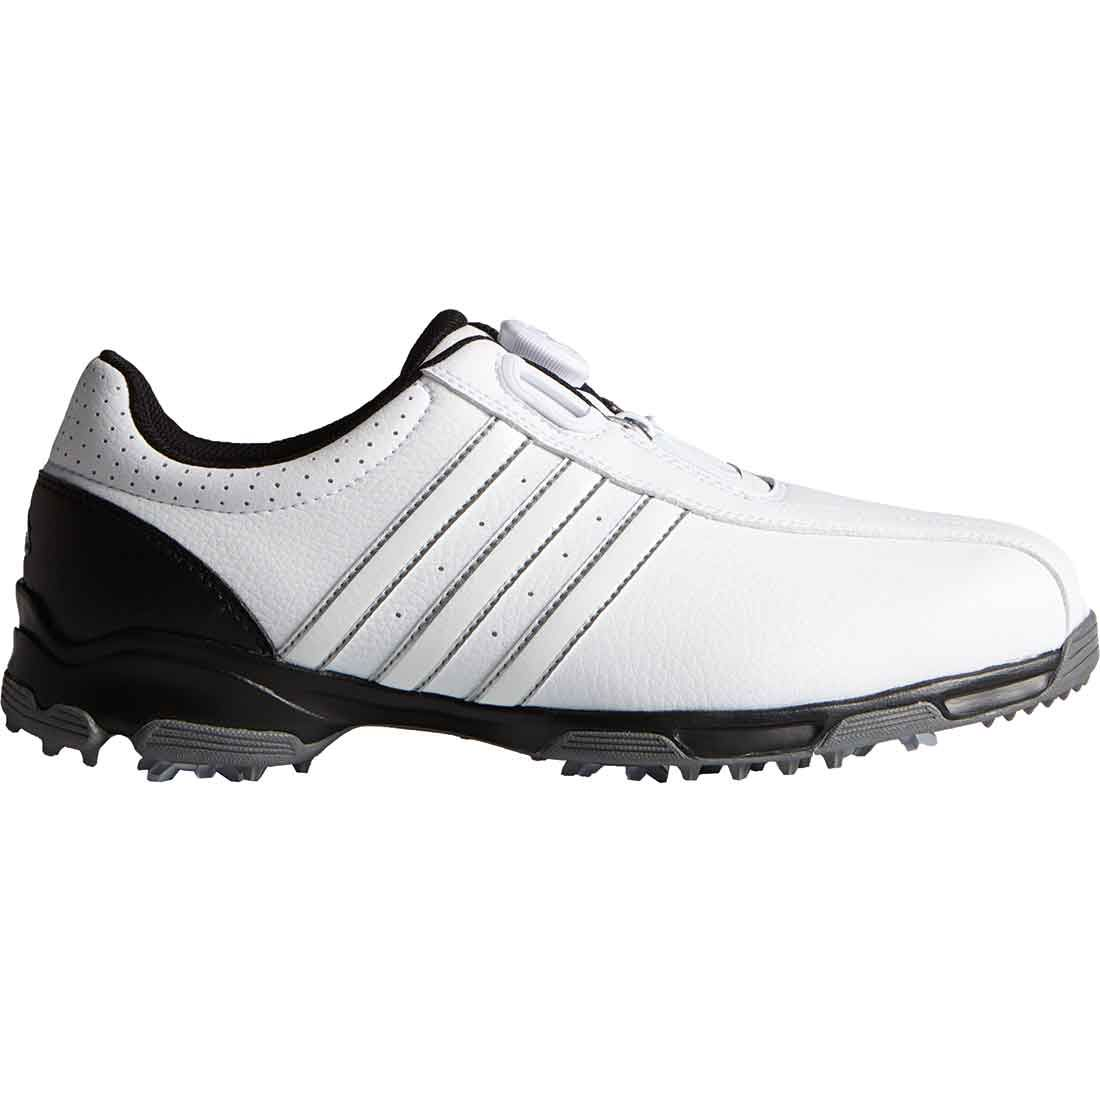 lazo Rango compacto  Buy Adidas 360 Traxion Boa Golf Shoes White/Black | Golf Discount